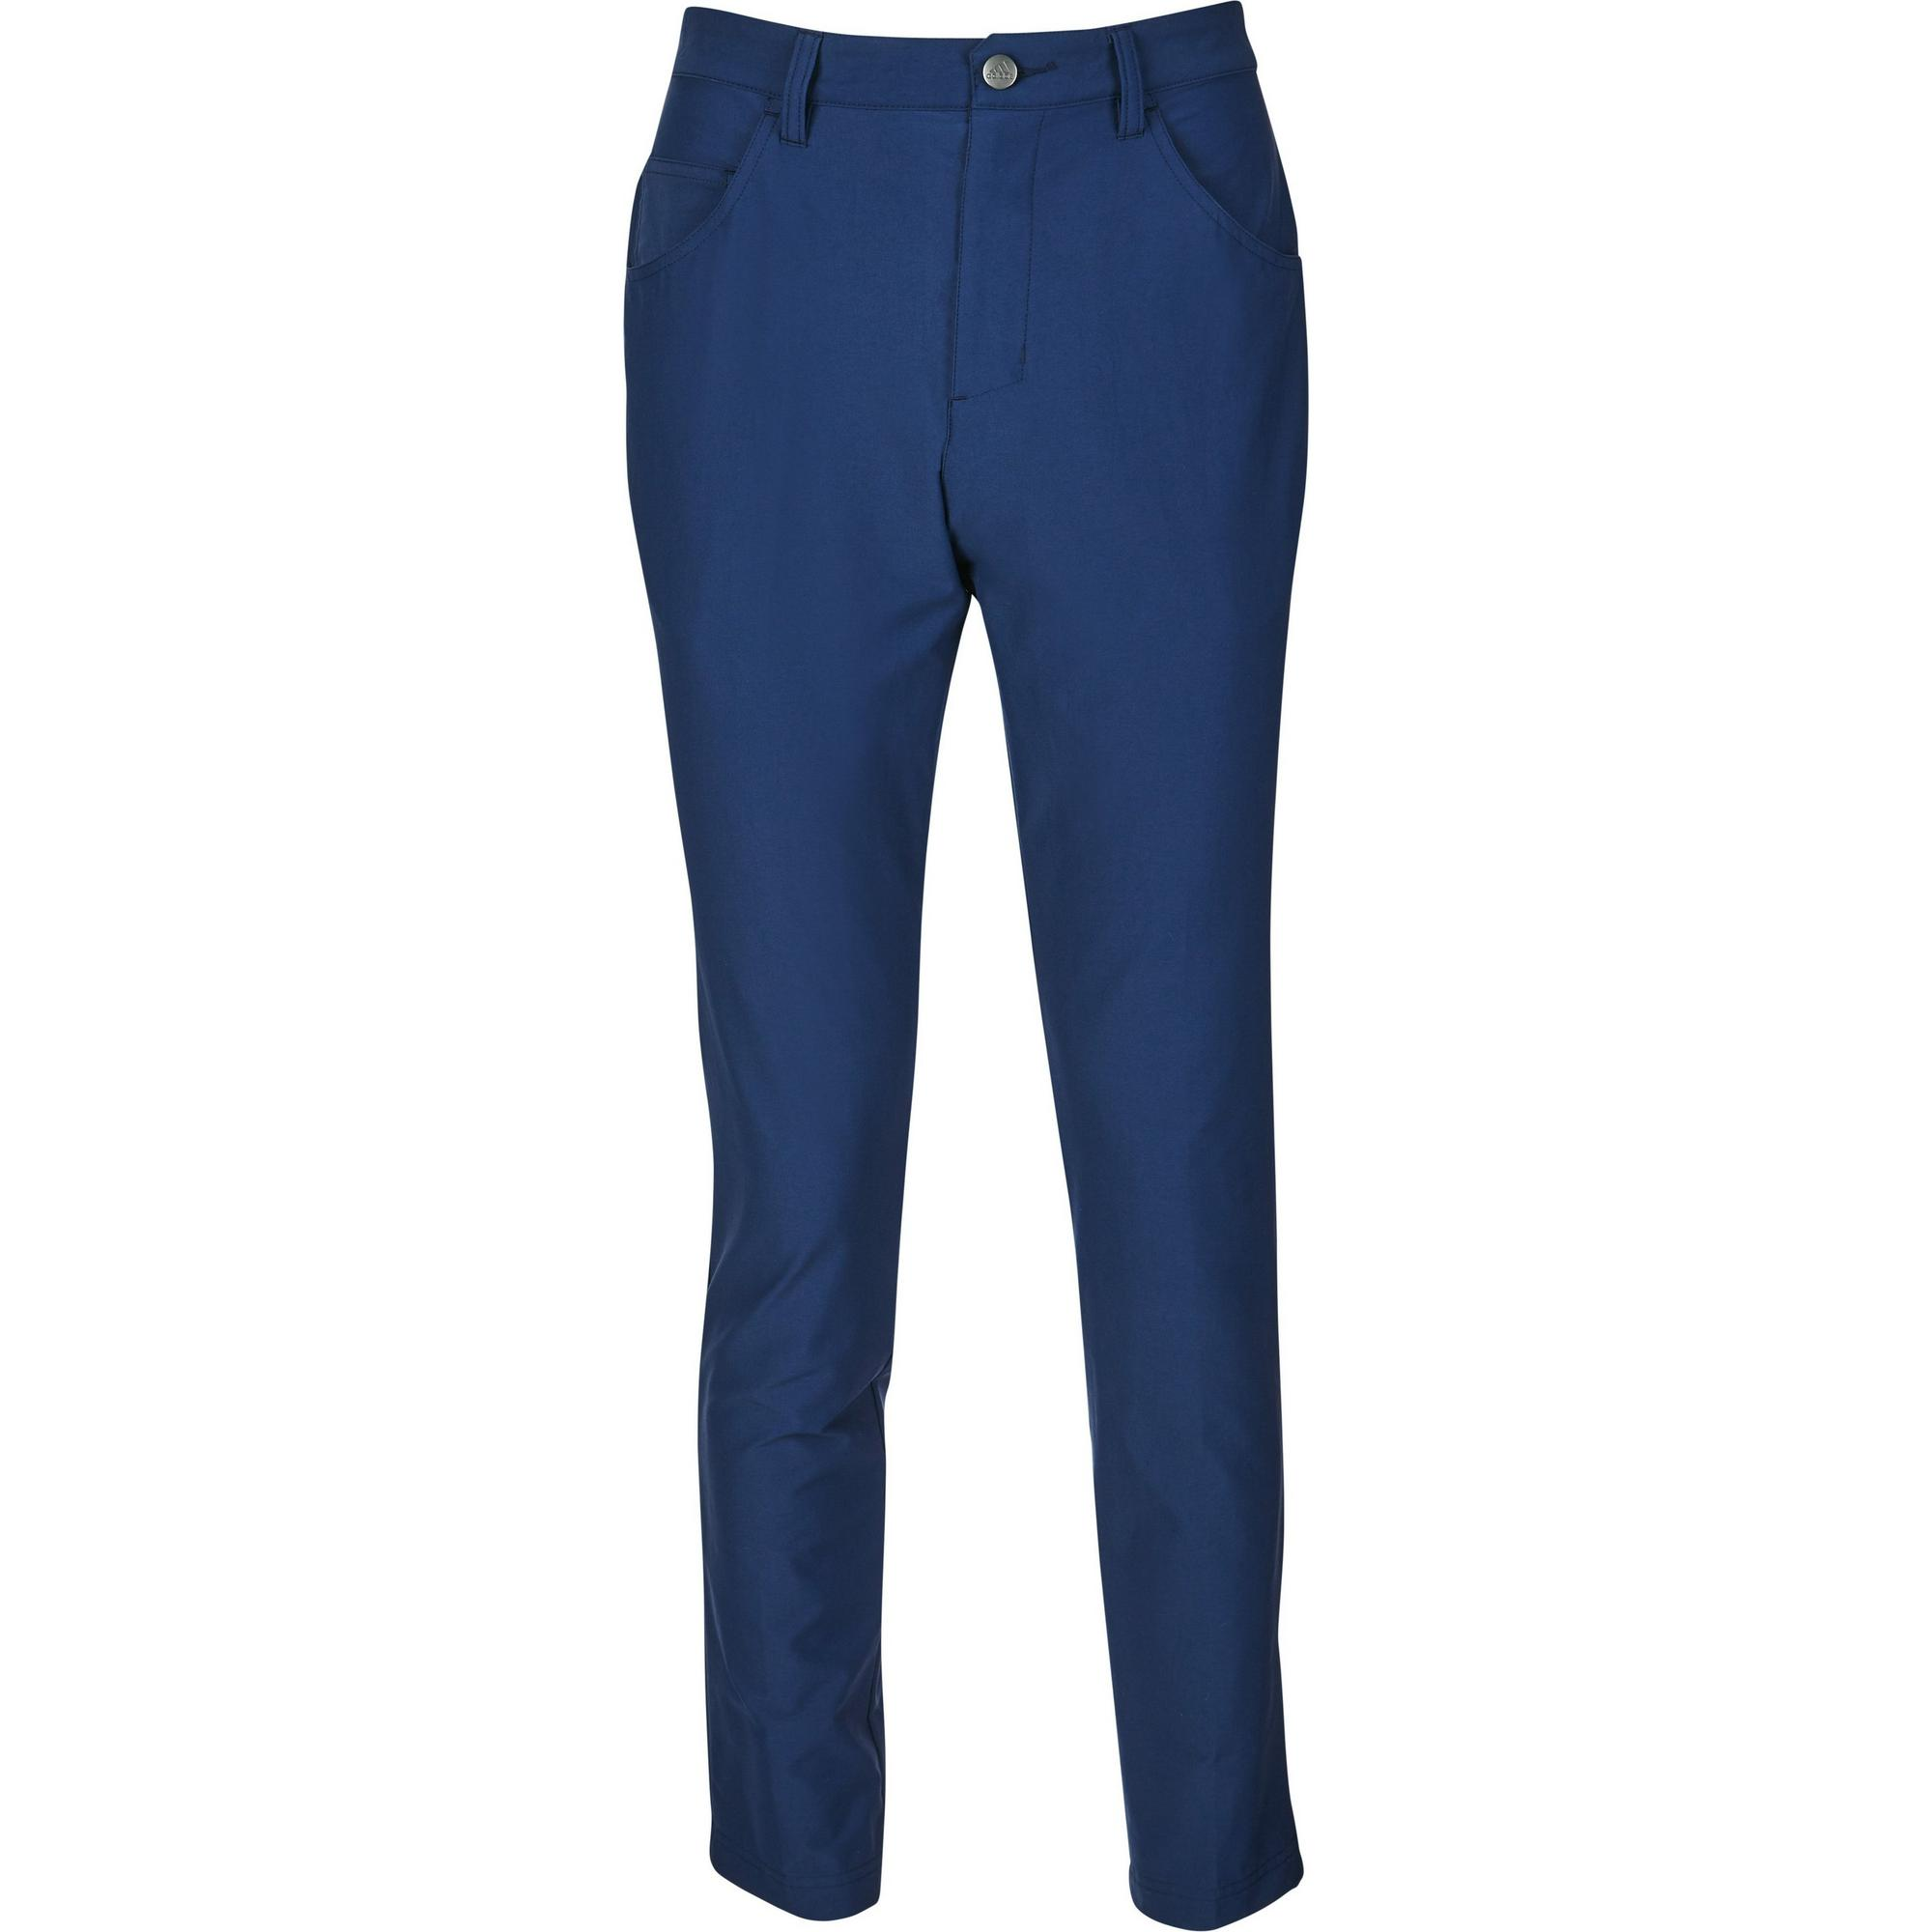 Men's adicross Beyond 18 Slim 5 Pocket Pant